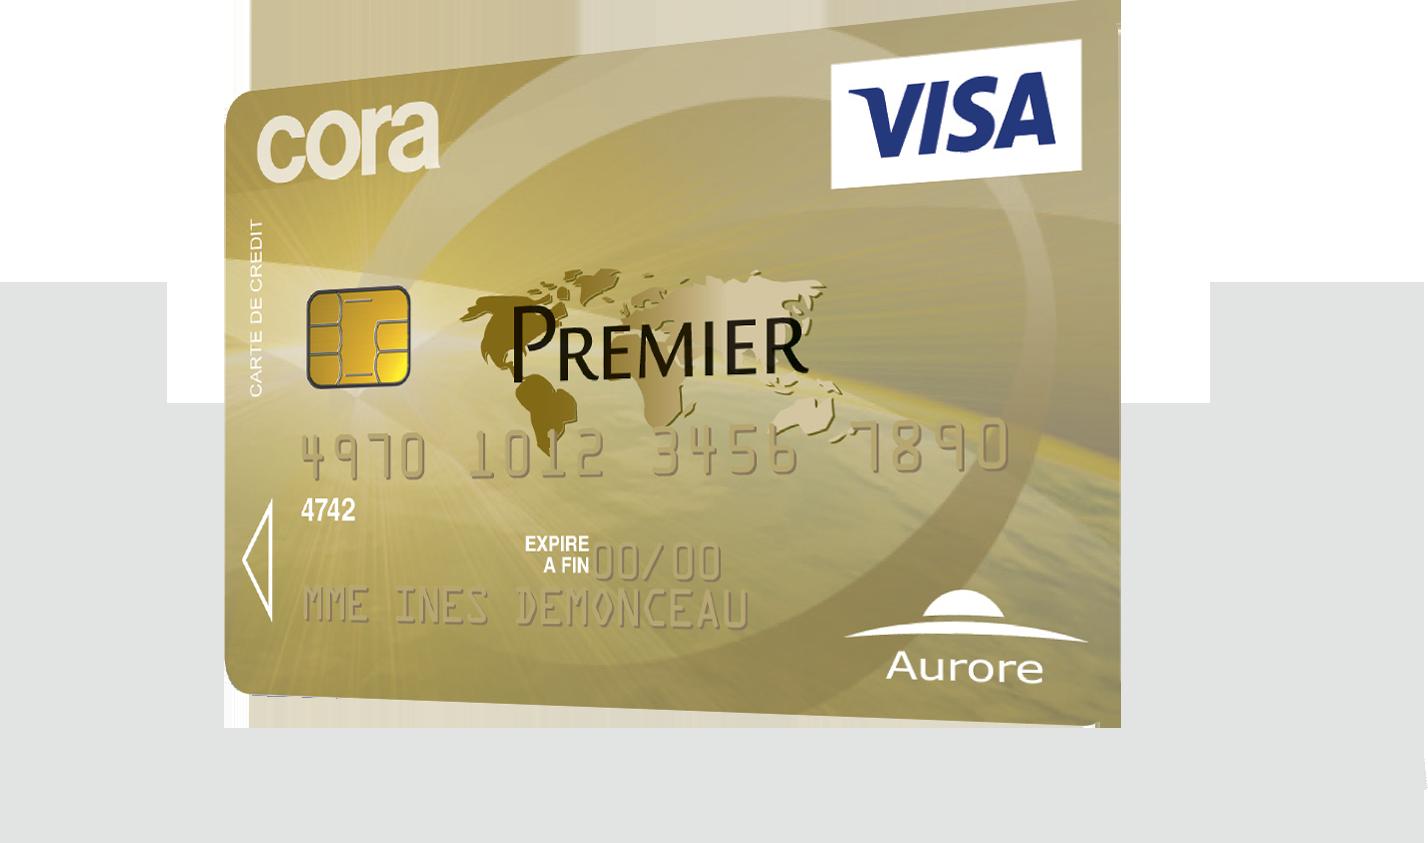 Carte Cora Eurocora.Carte Cora Visa Premier A Qui Est Elle Destinee